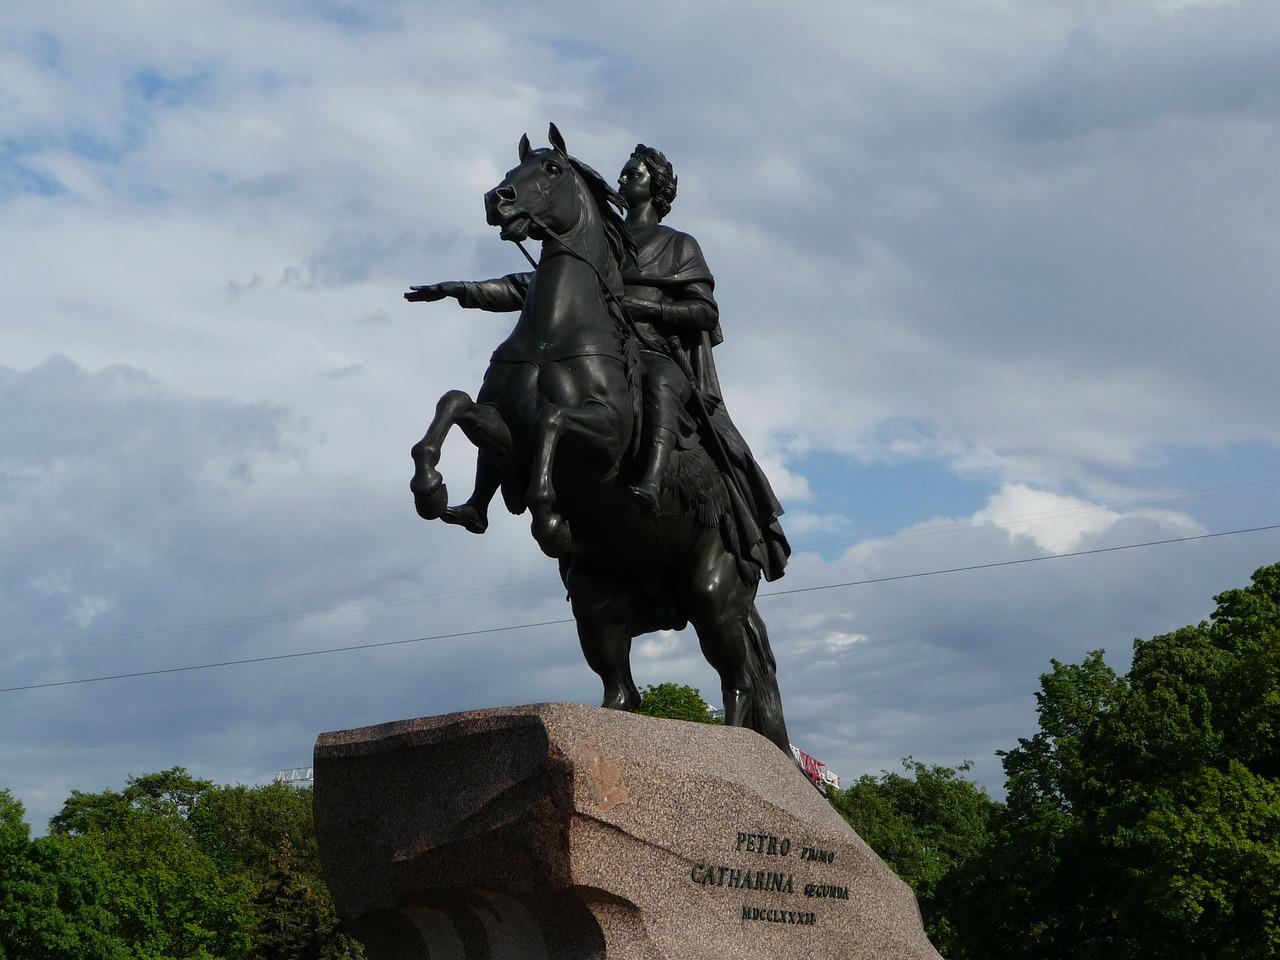 Monumento di San Pietroburgo